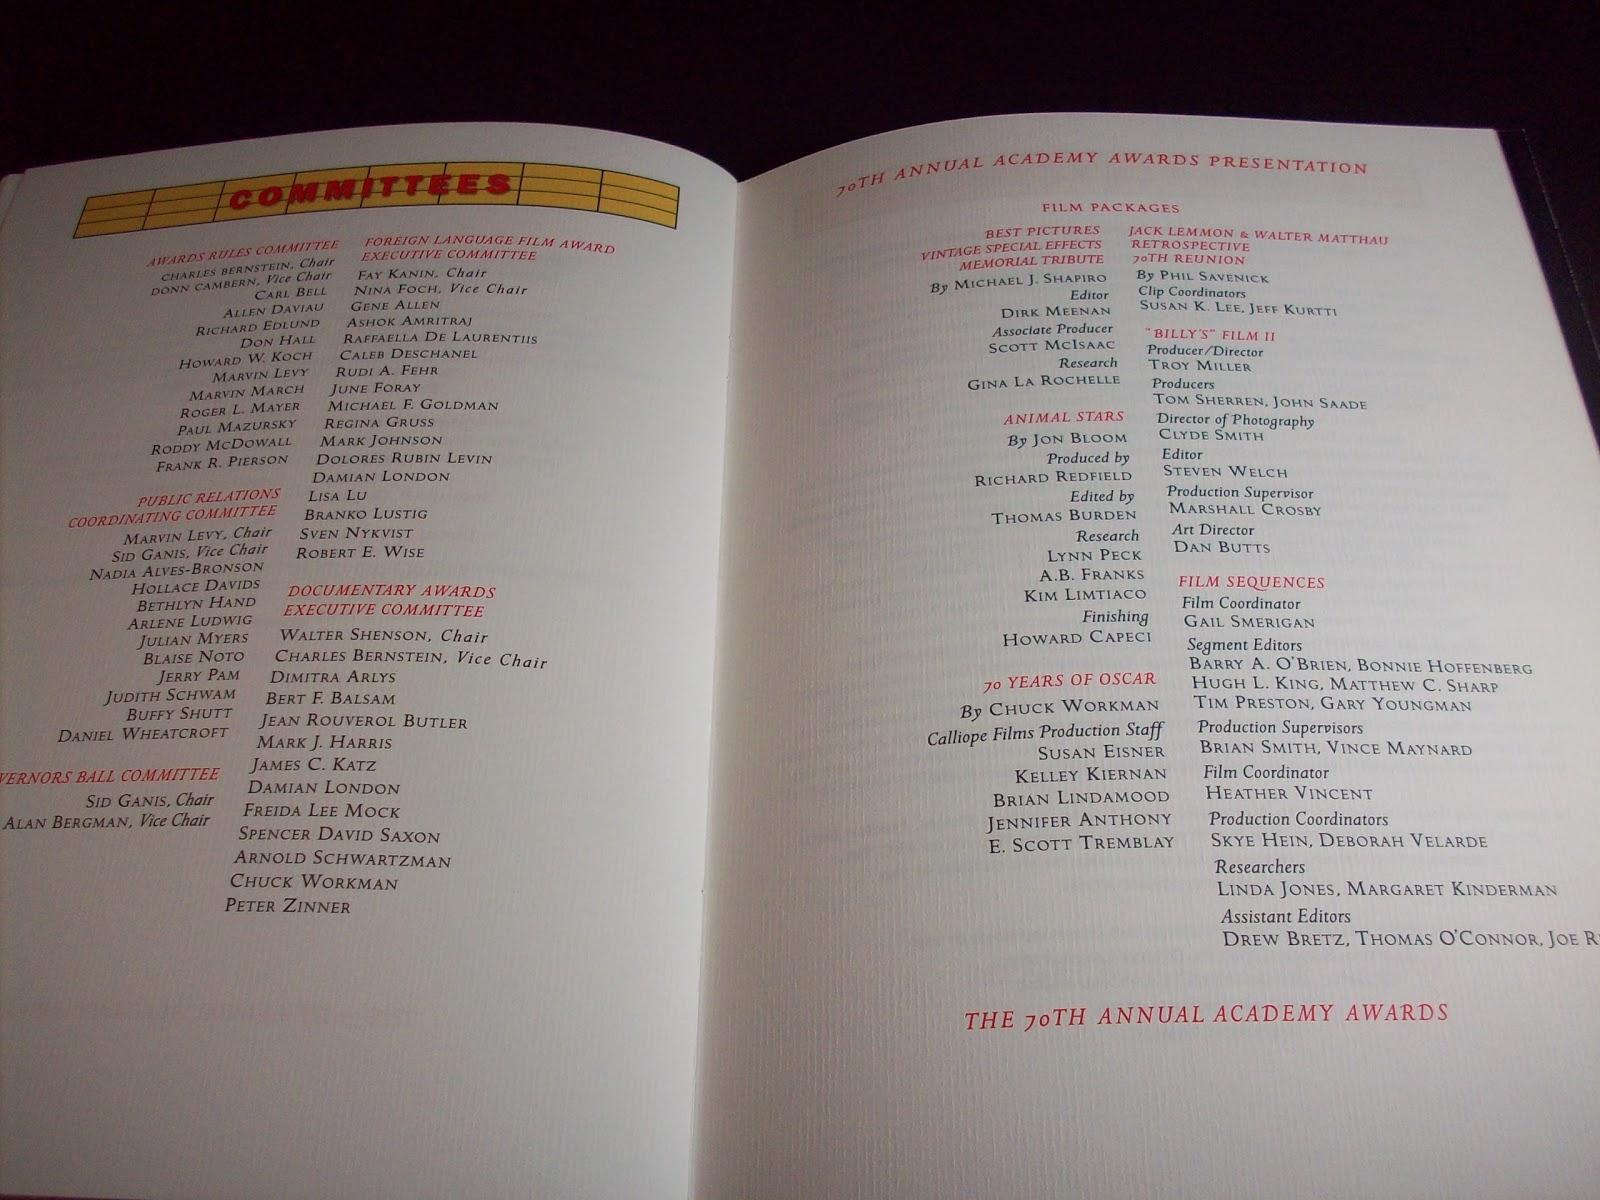 Academy Award Program p. 16 ) ( 70th Academy Awards Program image 20